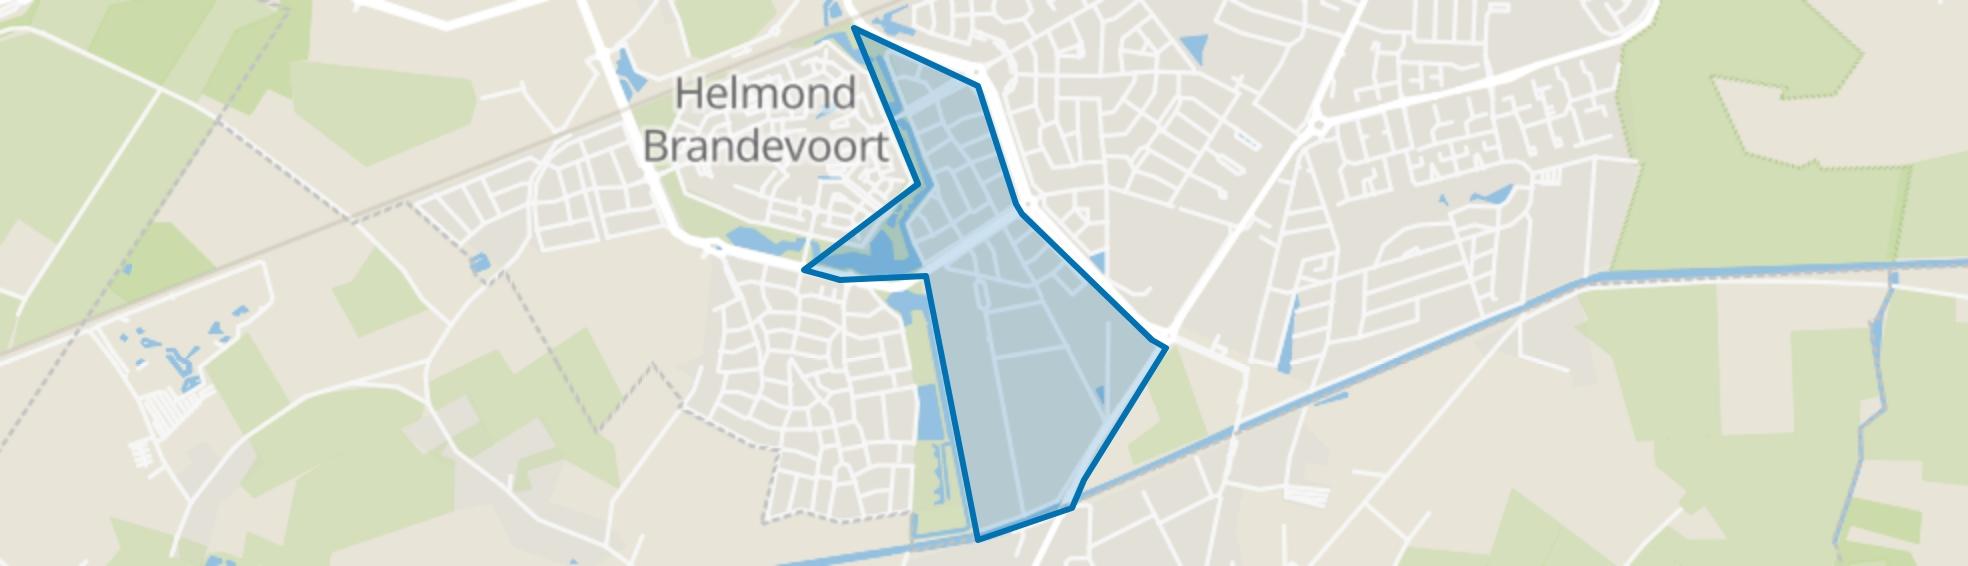 Brand, Helmond map